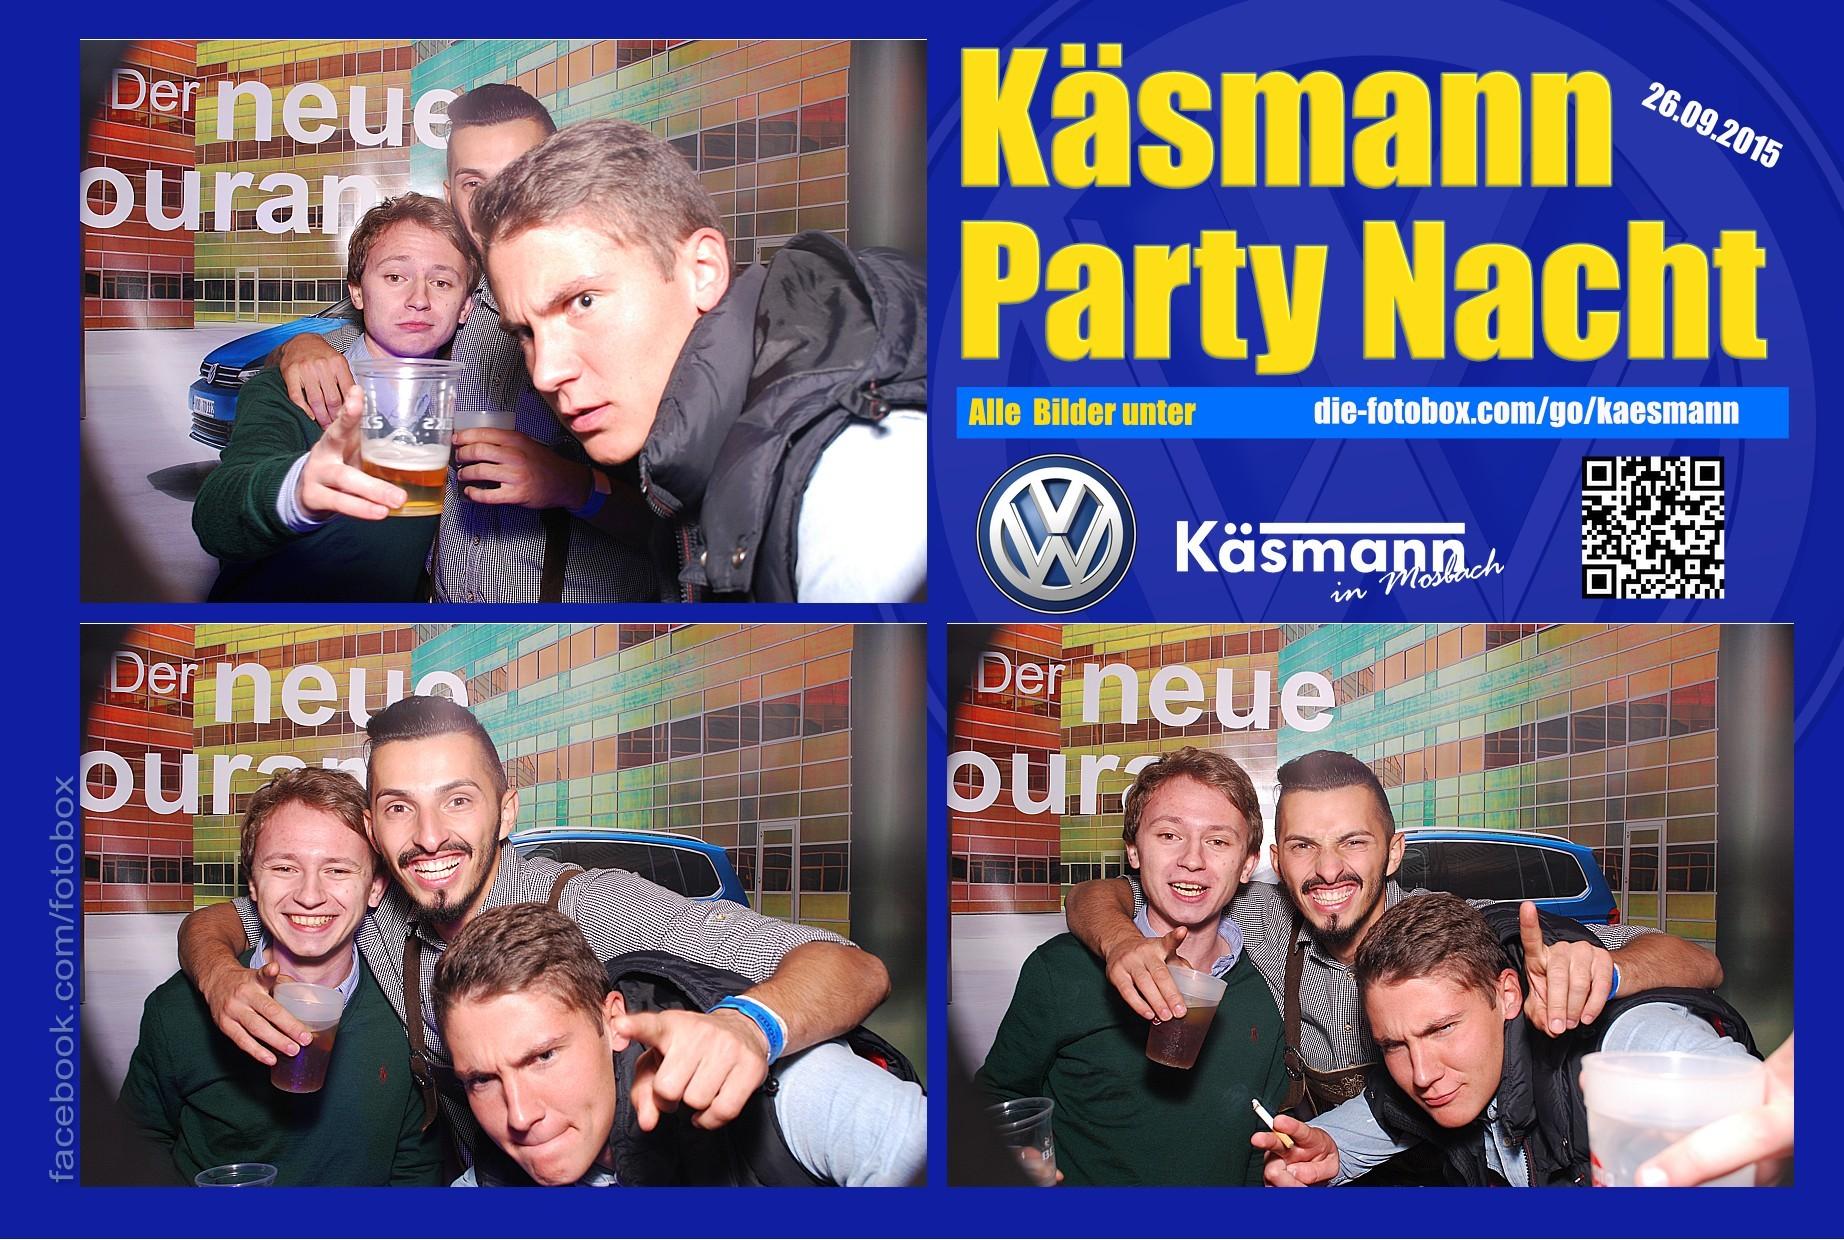 Käsmannparty 2015 - www.die-fotobox.com 01172